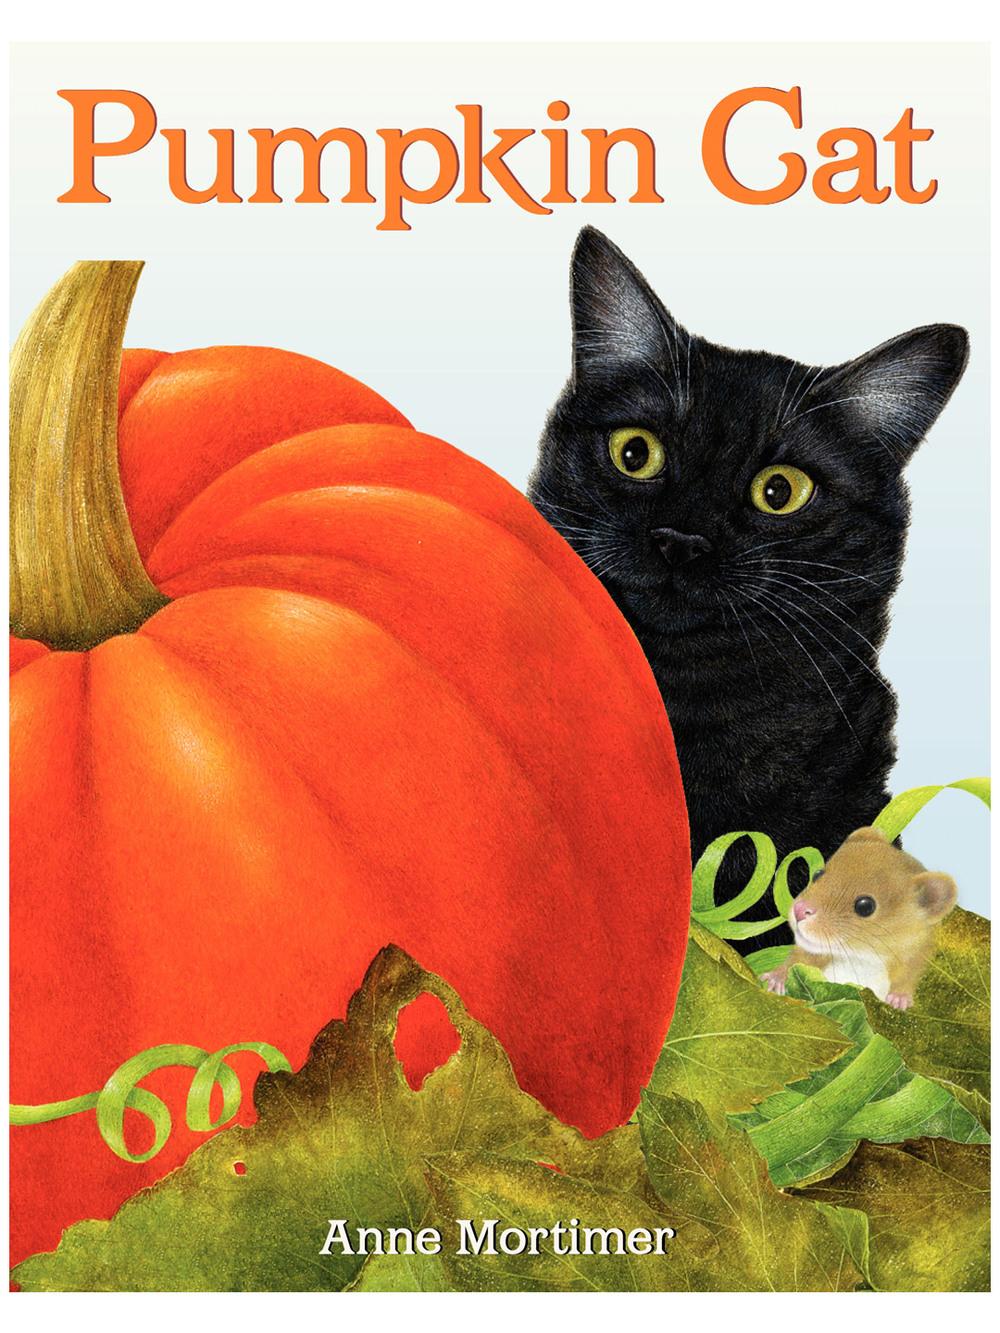 Pumpkin Catby Anne Mortimer